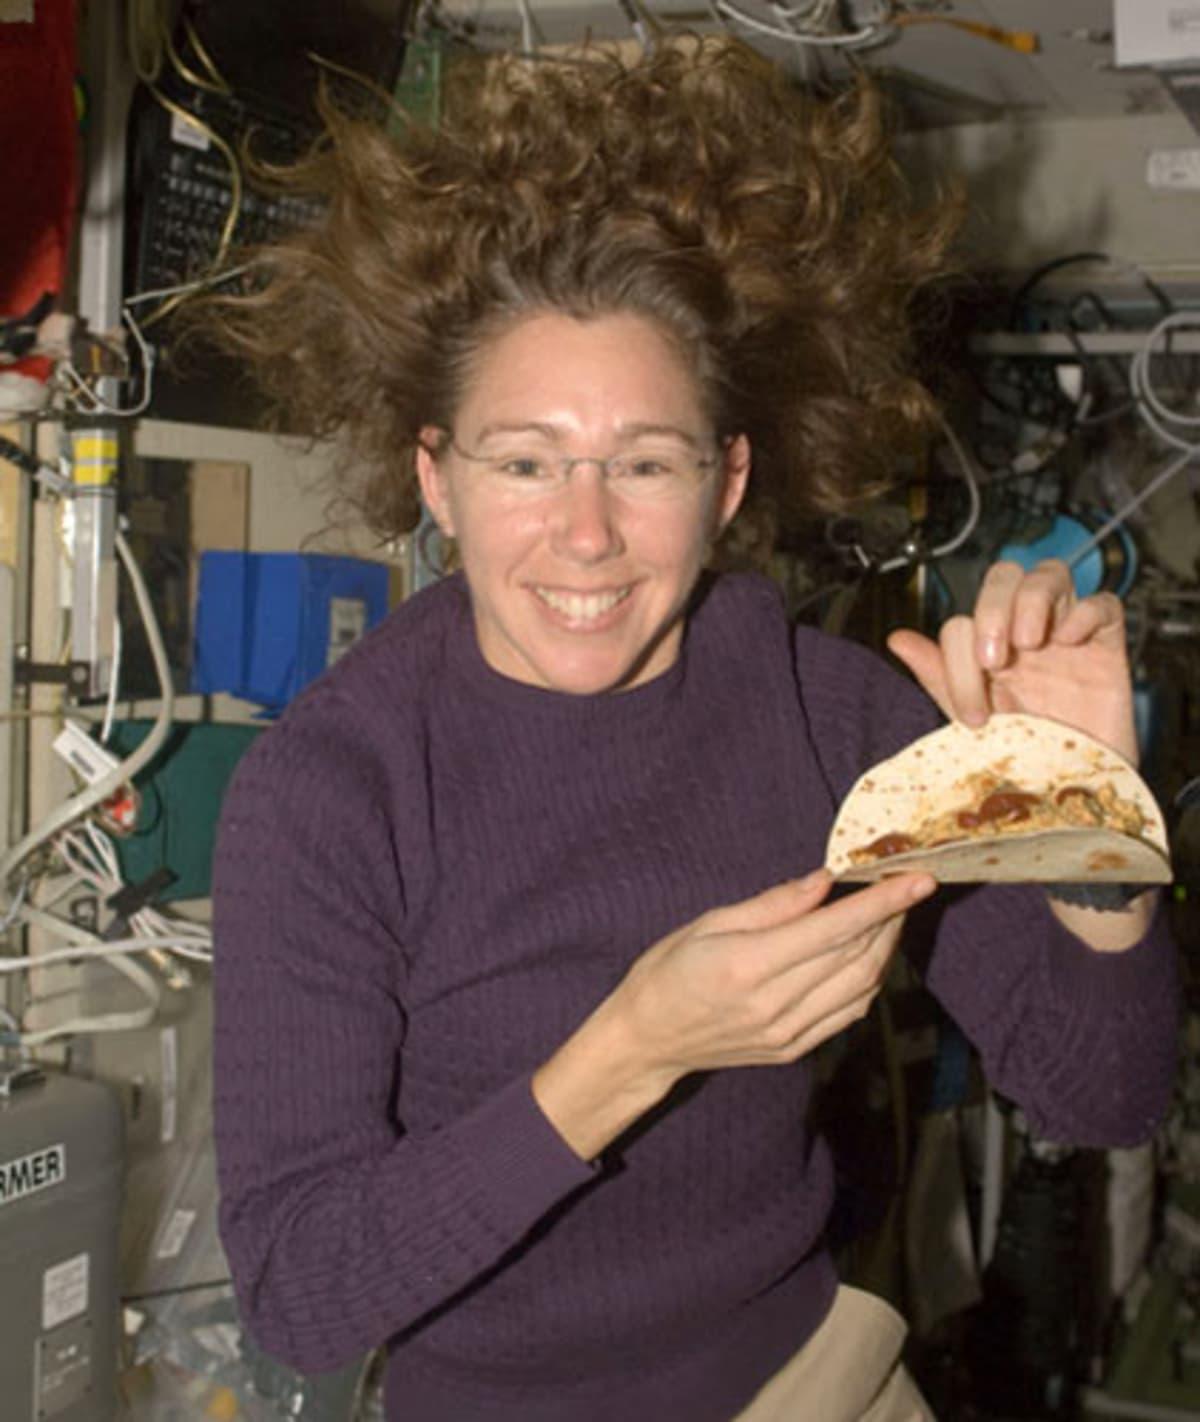 astronaut taco space - photo #11